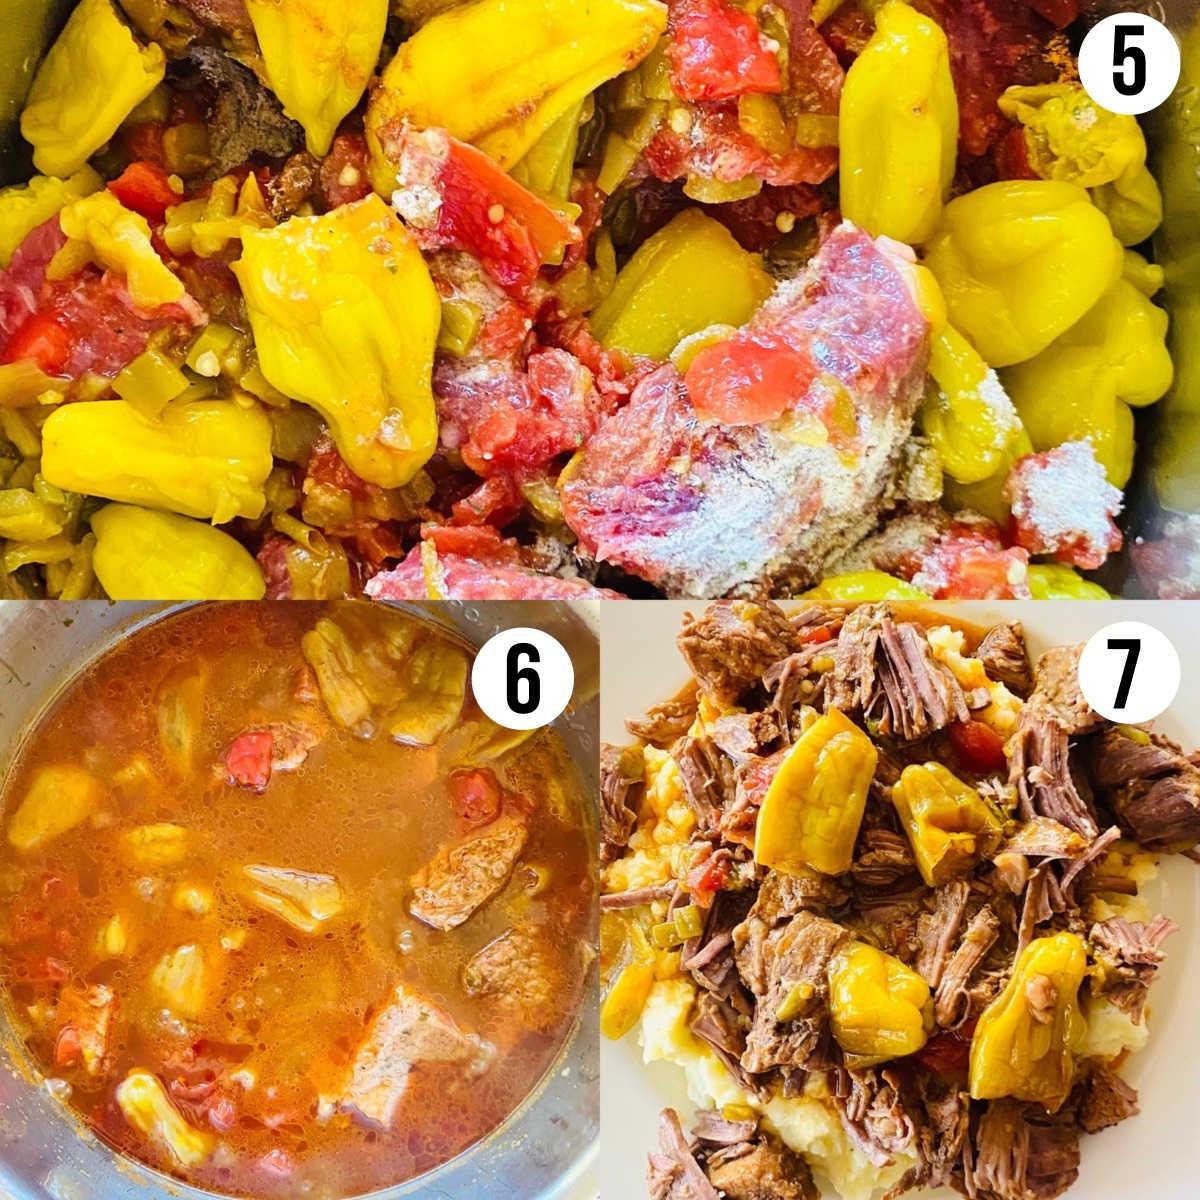 process shots 5-7 to make instant pot tri tip recipe